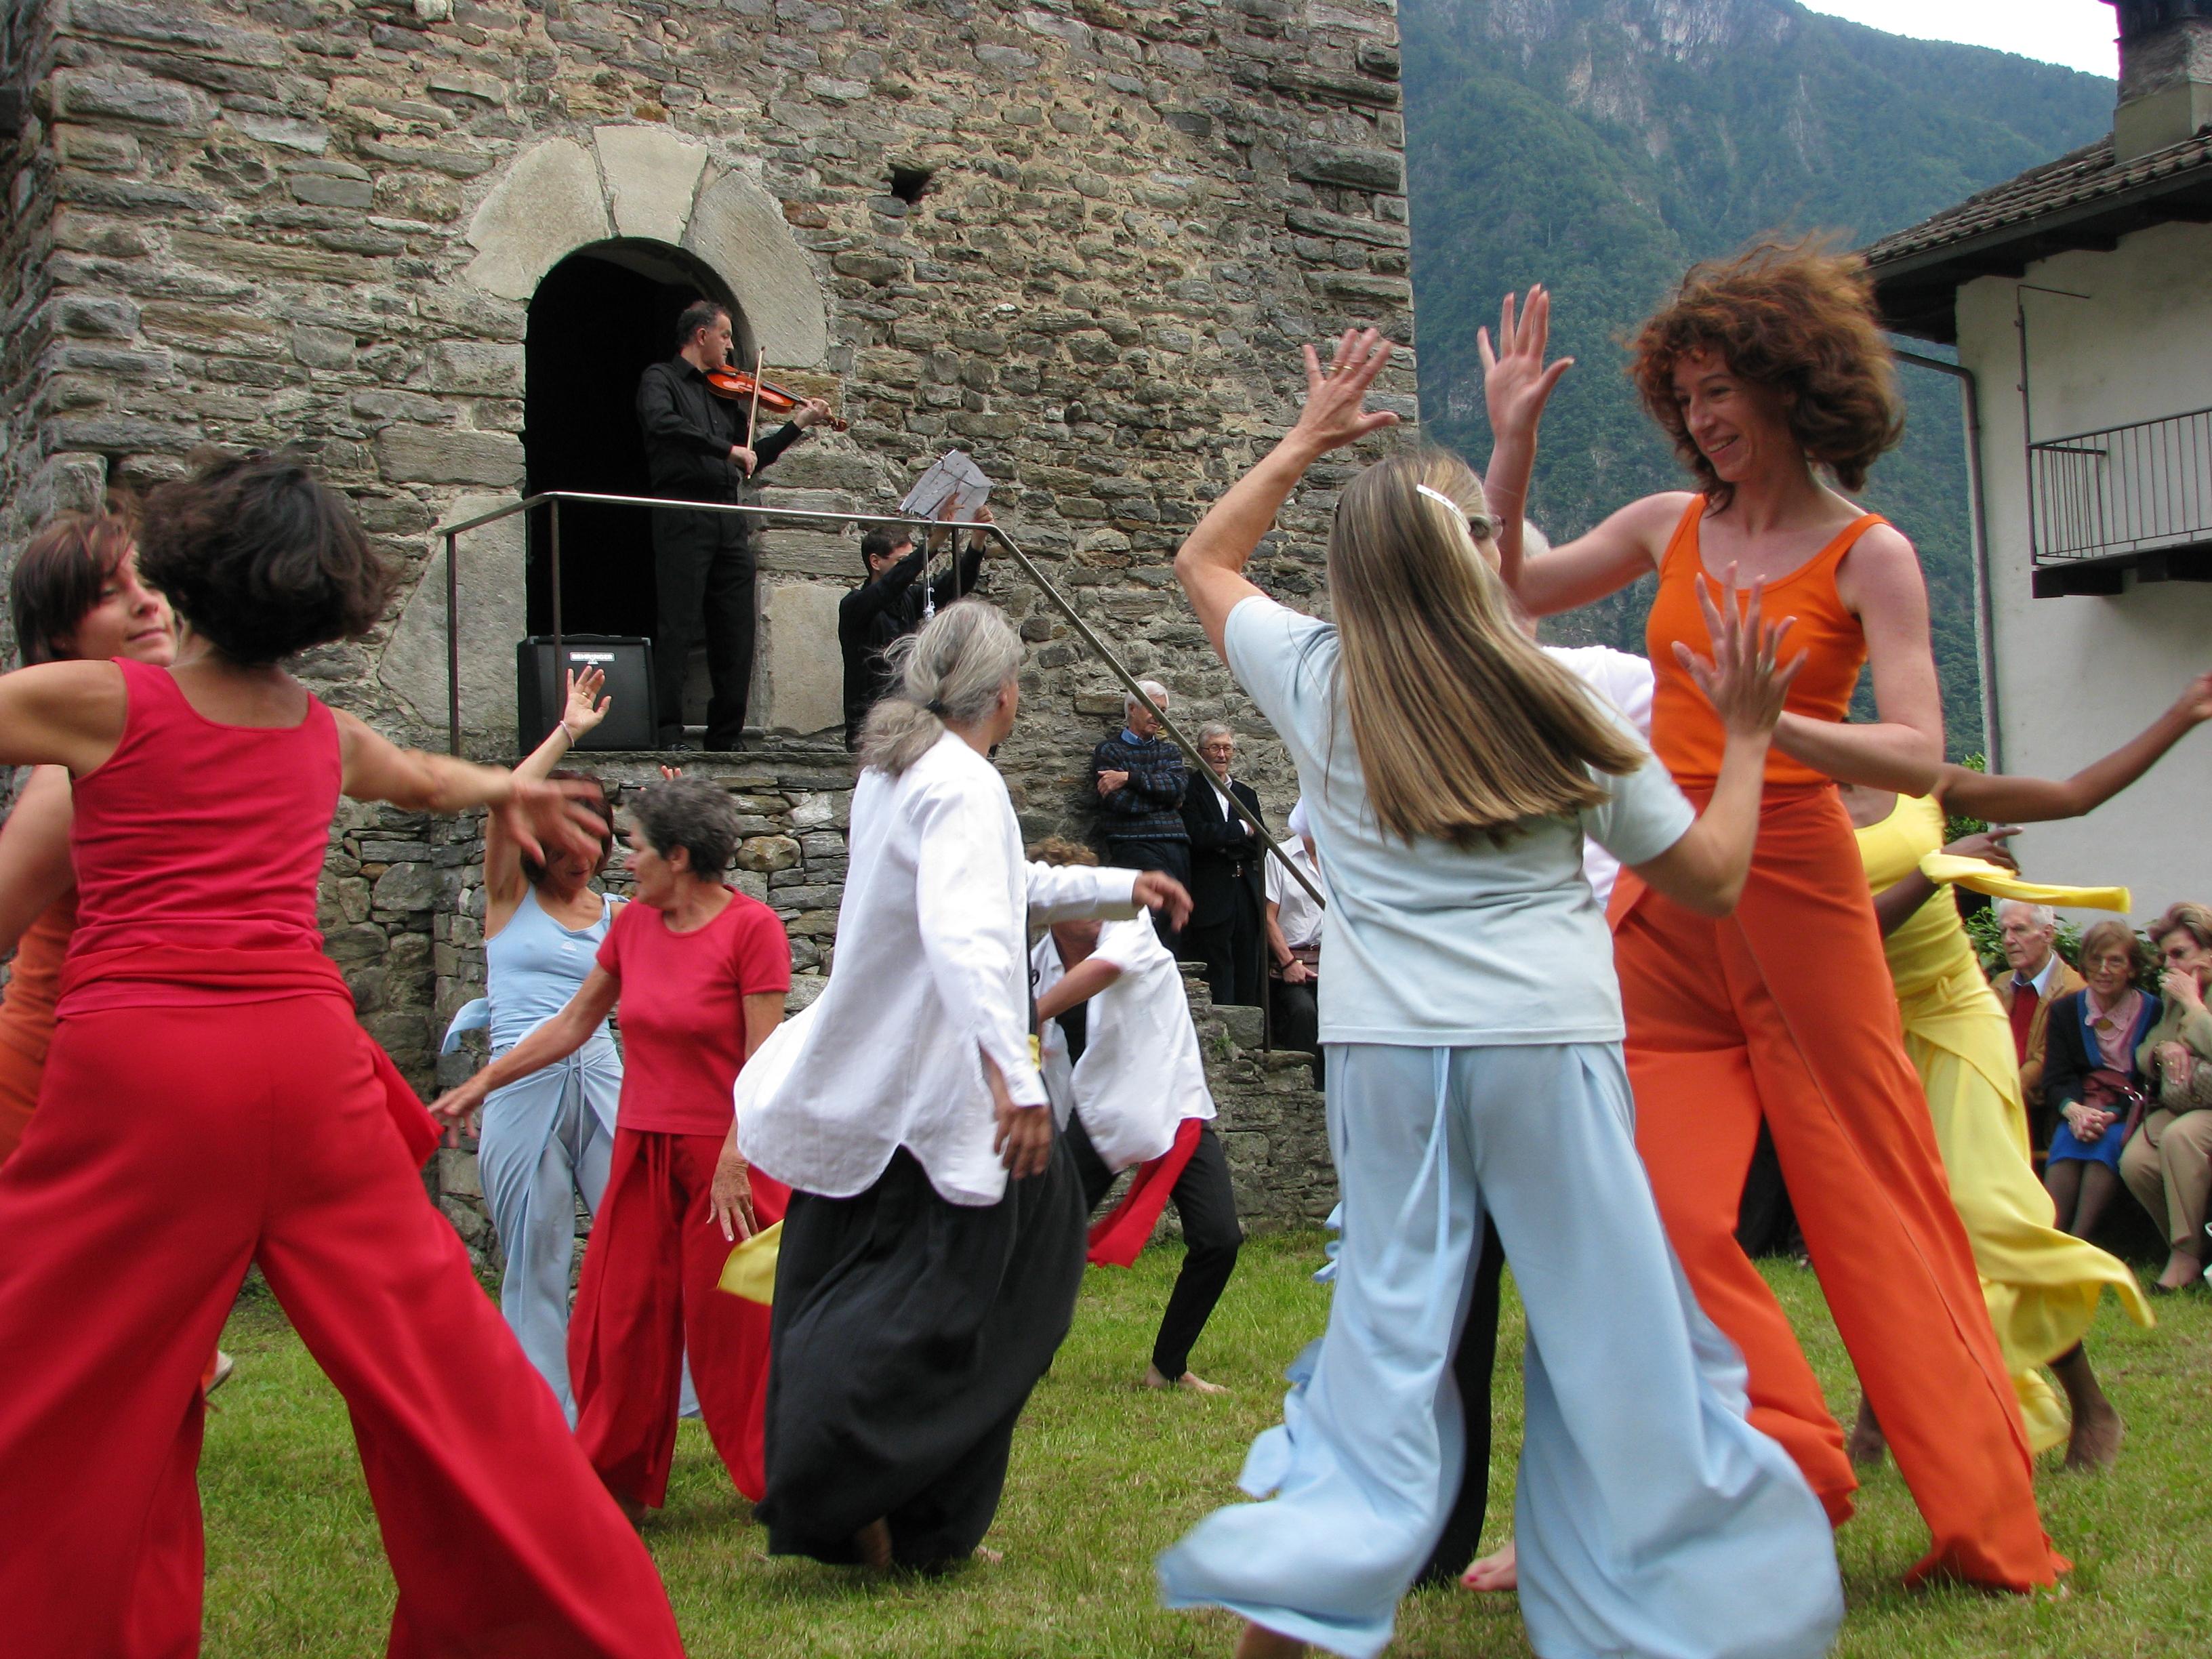 Danza Spontanea E Creativa